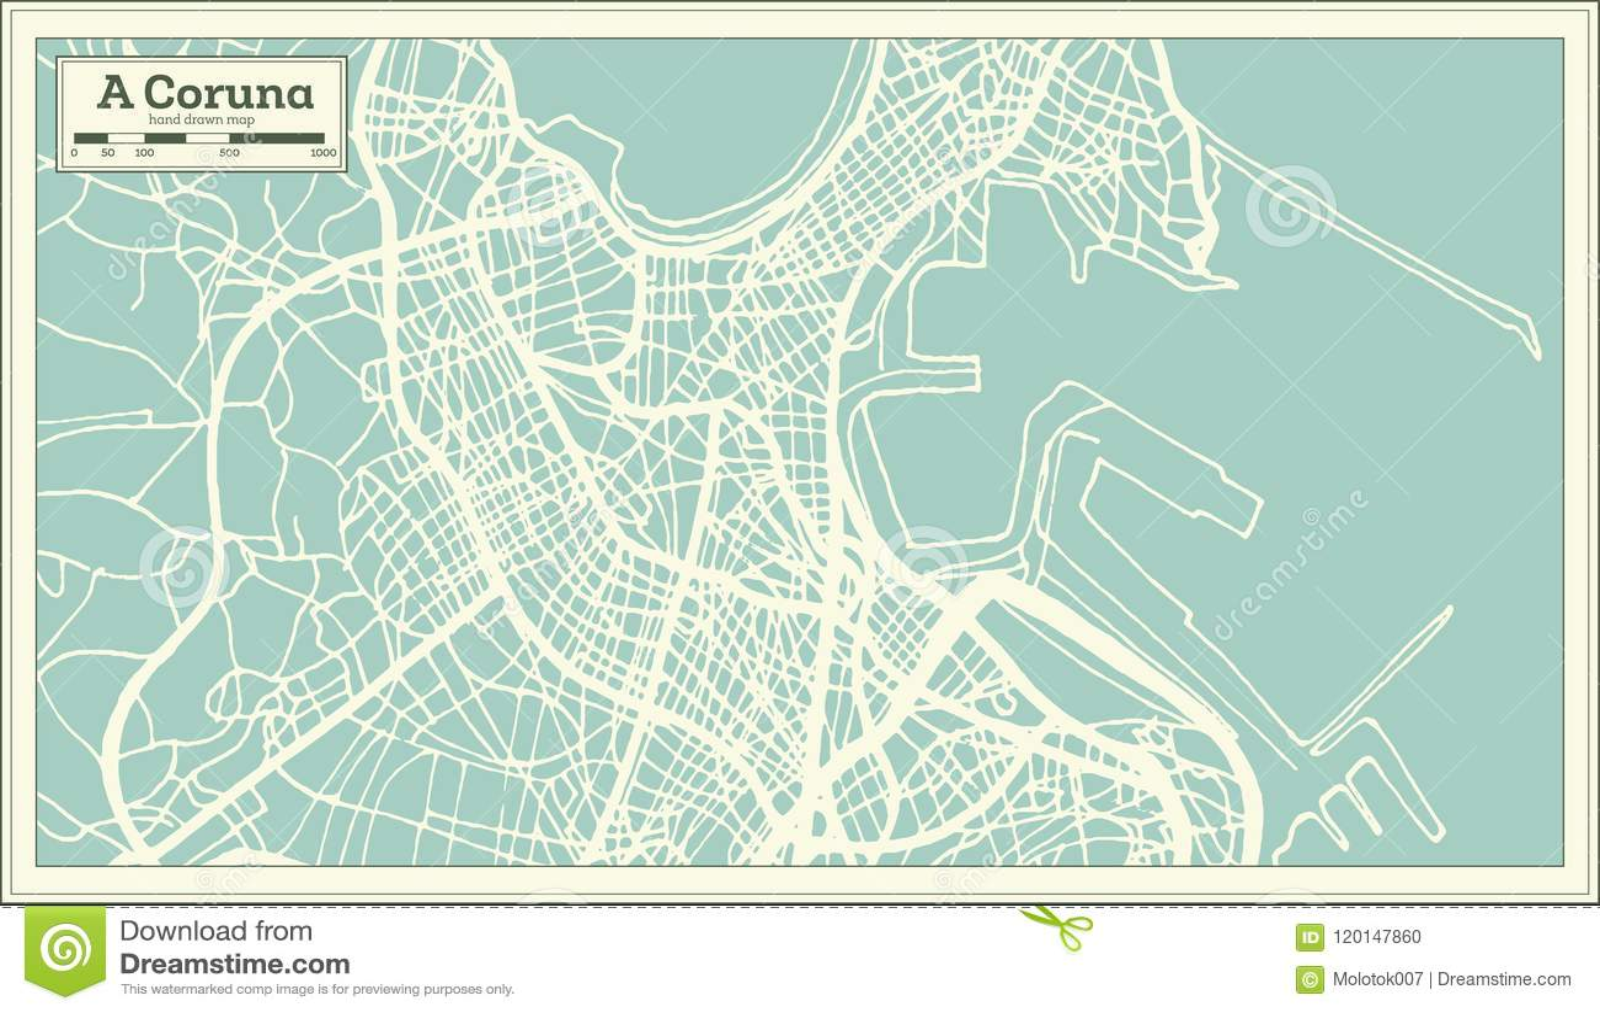 Map Of Spain La Coruna.A Coruna Spain City Map In Retro Style Outline Map Stock Vector